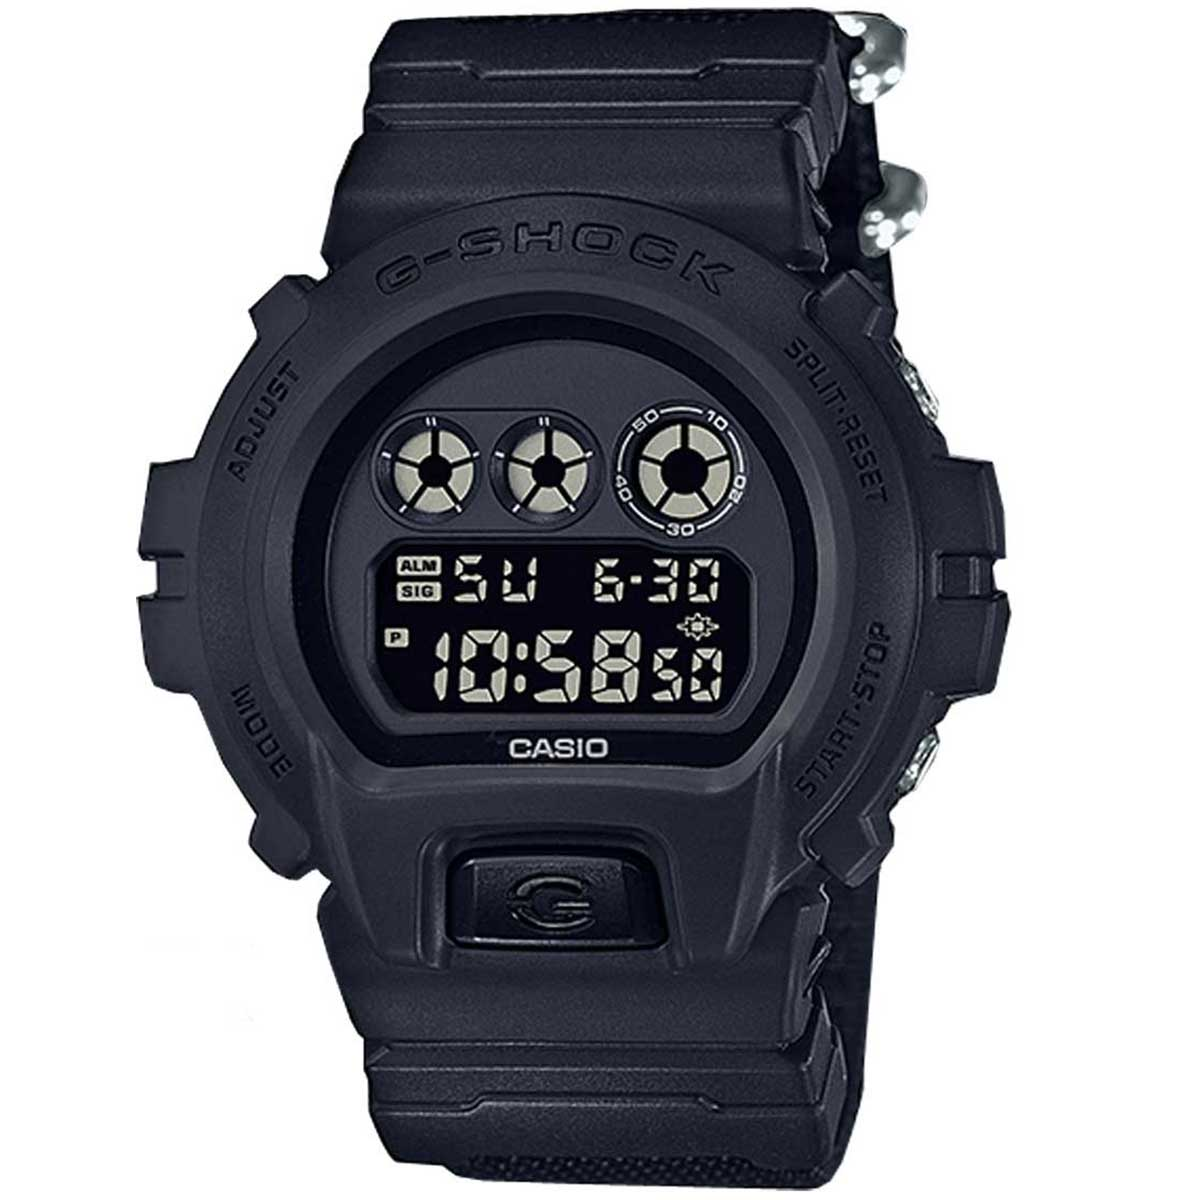 Relógio de Pulso Casio G-Shock Digital DW-6900BB-1DR